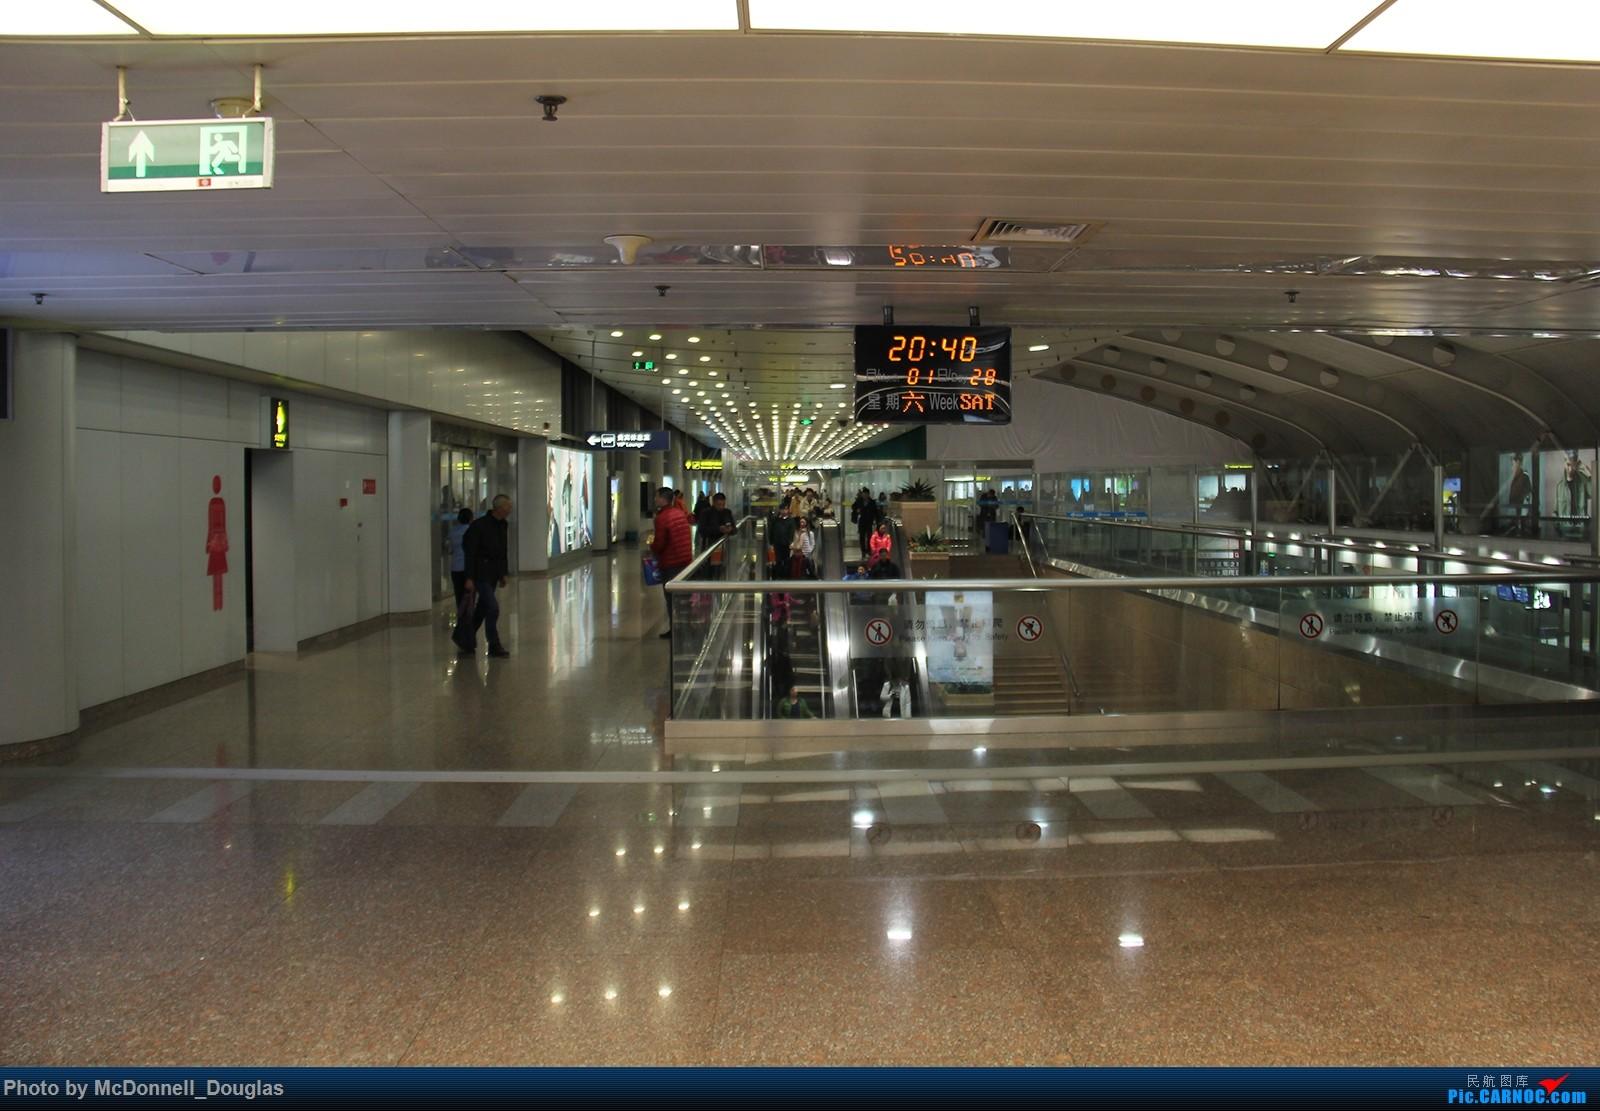 Re:[原创]【上海飞友会】【zc带你游天下(4)】不远千里飞跃喜马拉雅去看你,探寻高山另一边的神秘国度,和一群贫穷却快乐着的人们 AIRBUS A321-200 B-6642  中国北京首都国际机场